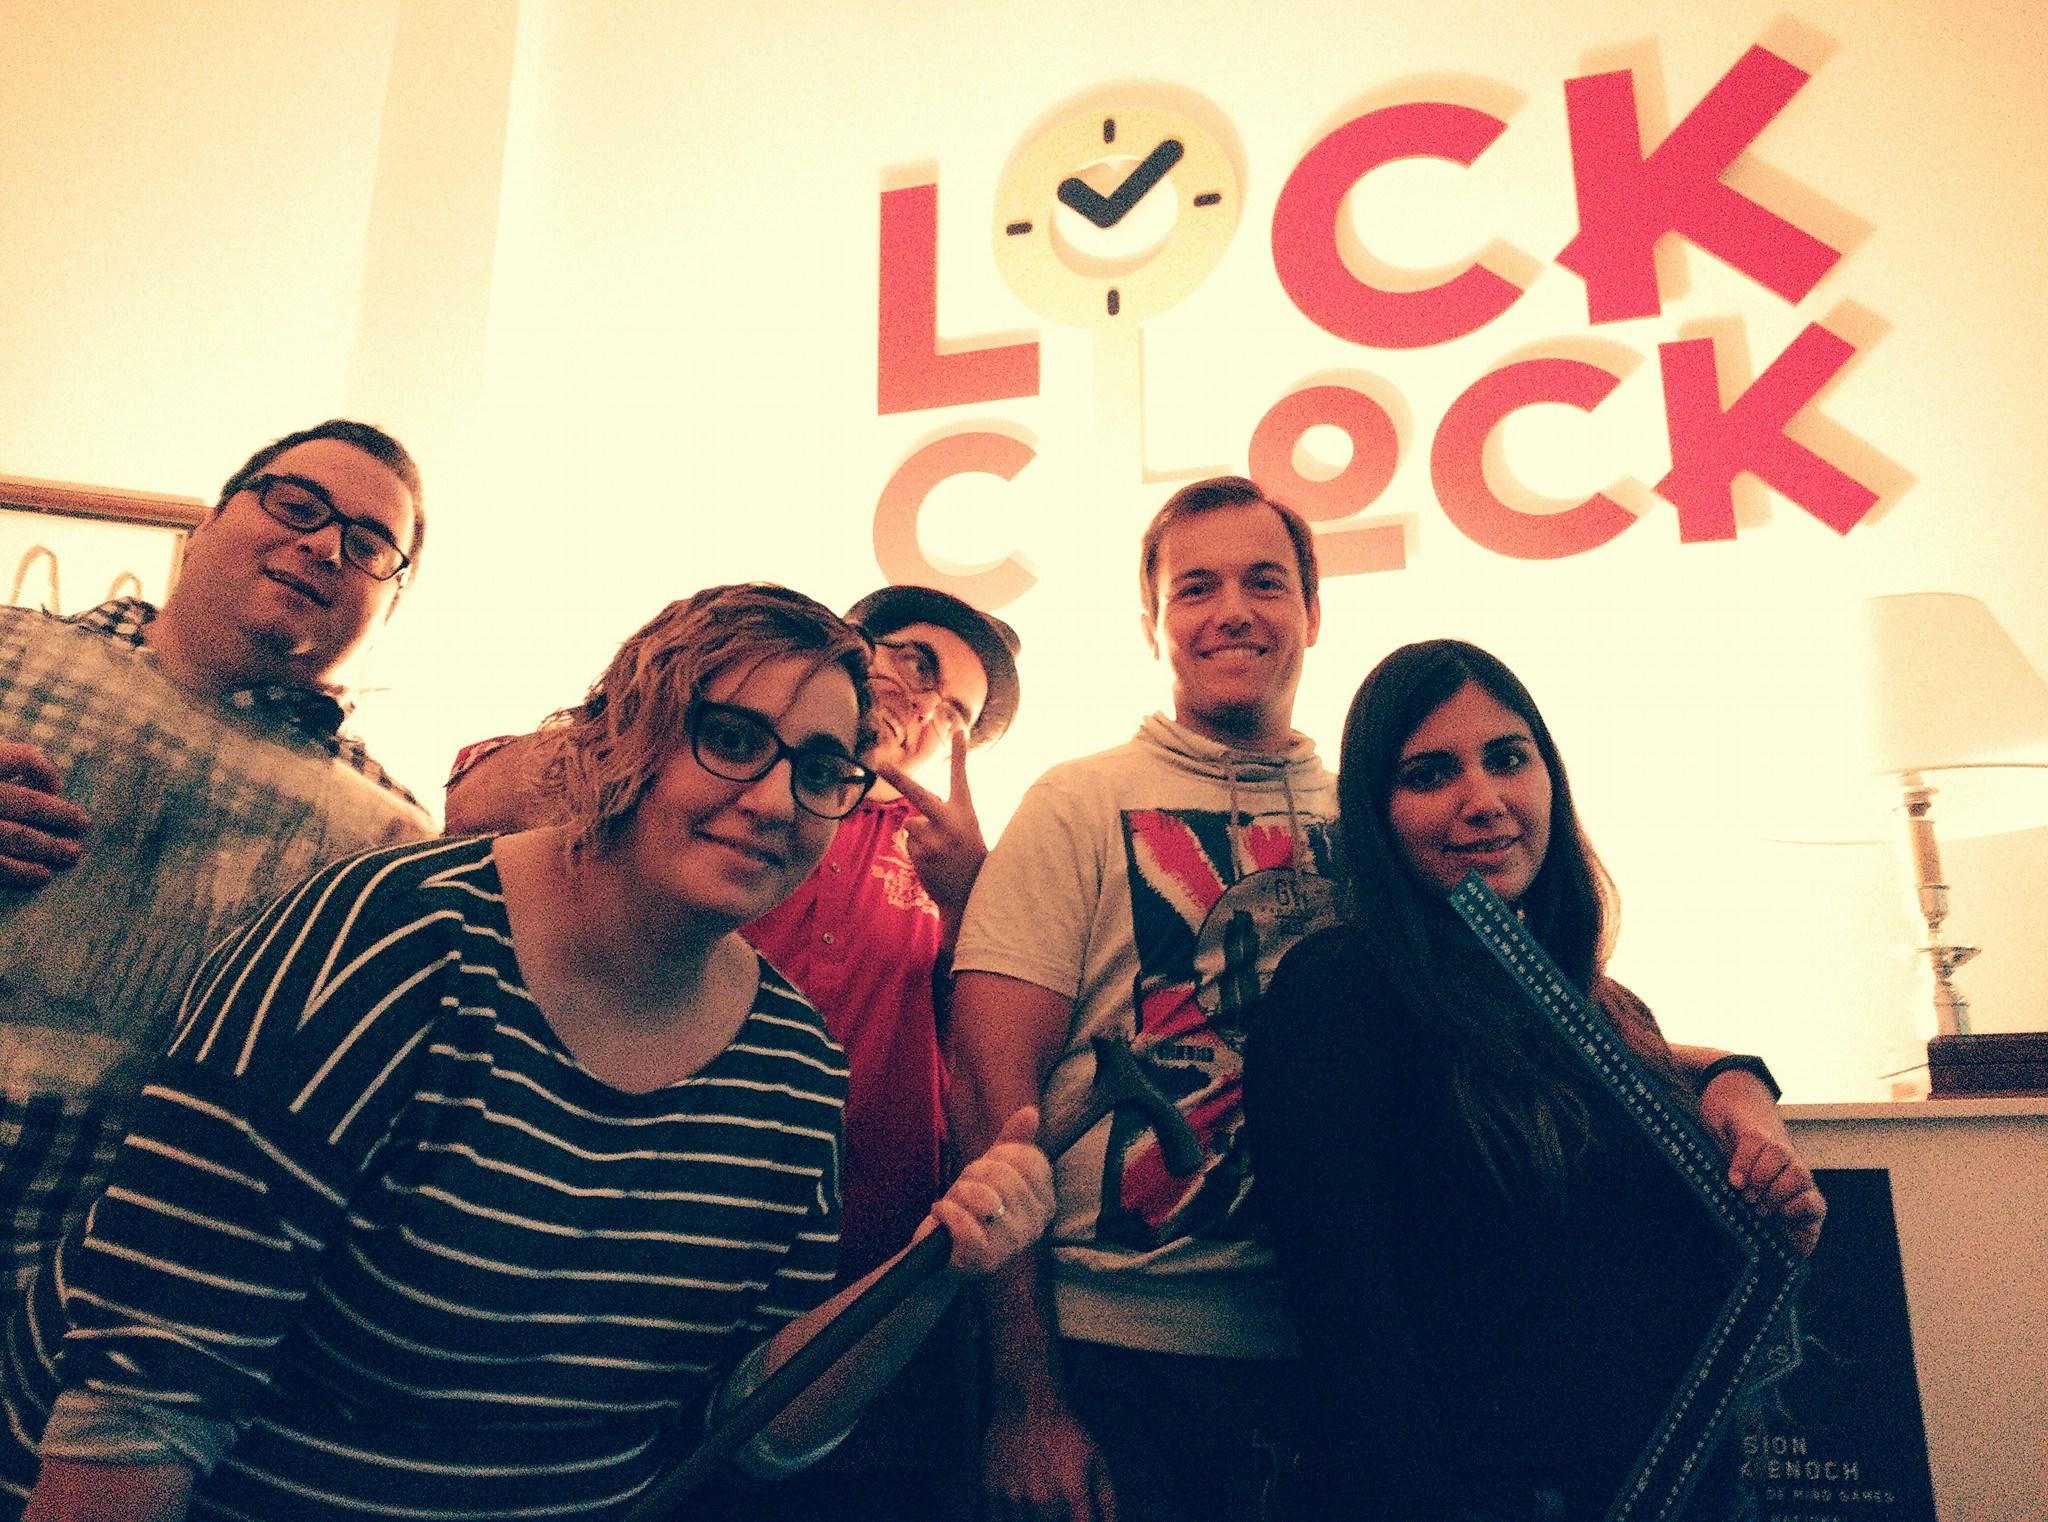 Lock Clock Barcelona – El taller de Gaudí